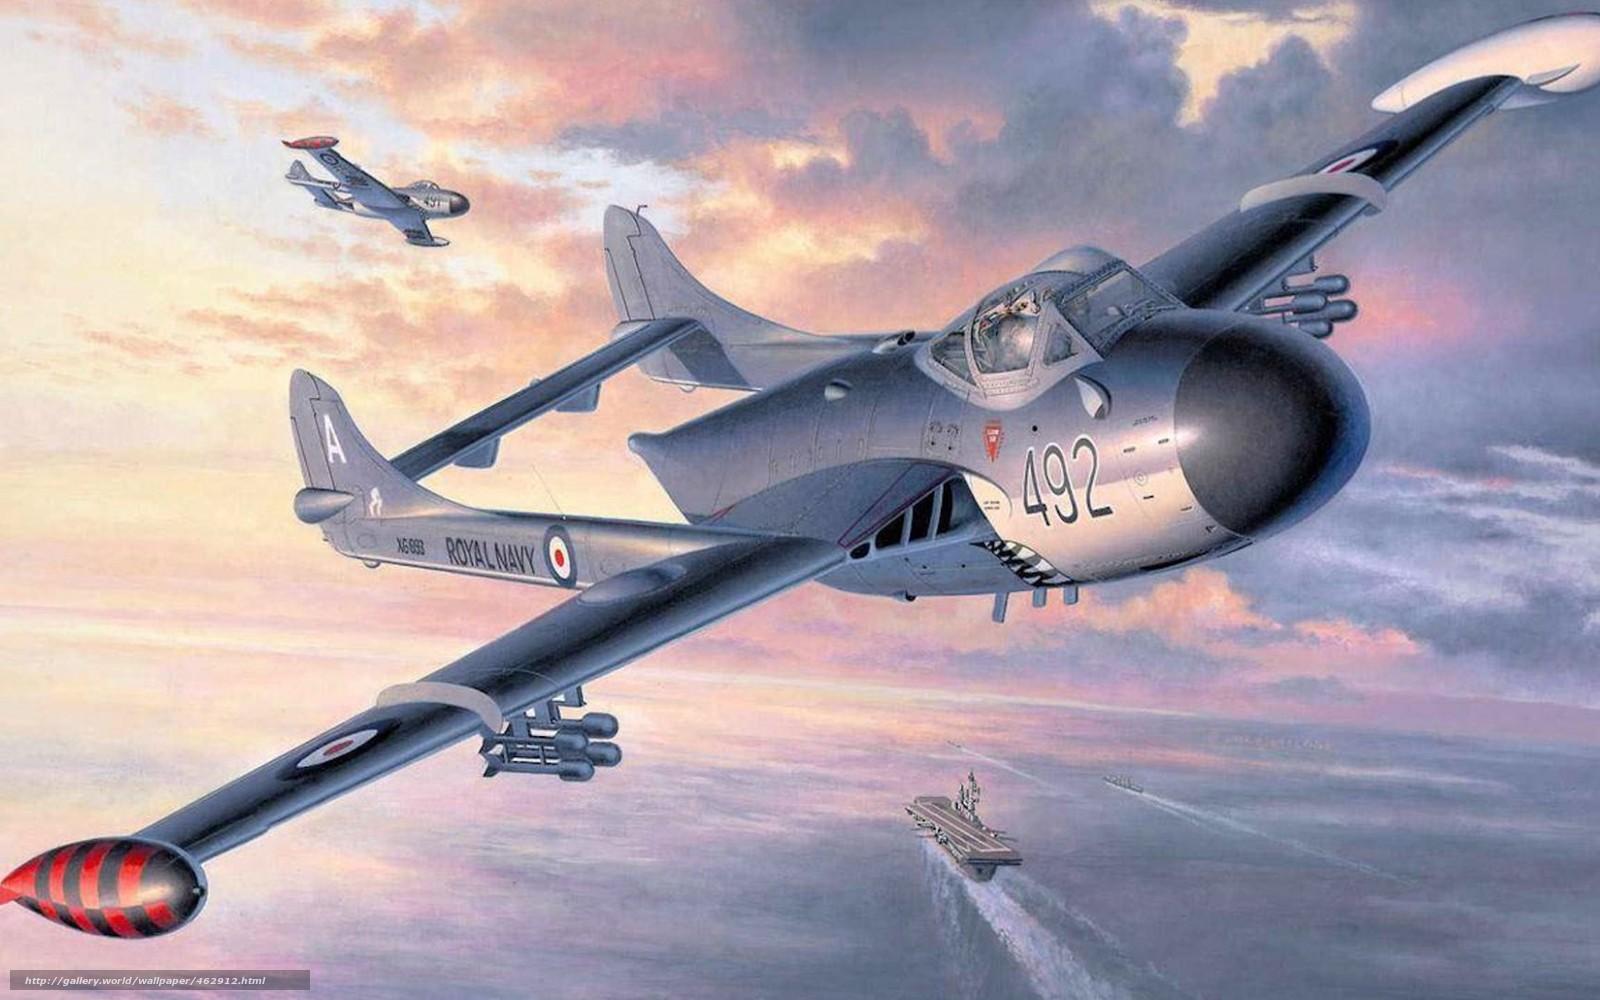 Tlcharger fond d 39 ecran dessin plan porte avions mer - Dessin porte avion ...